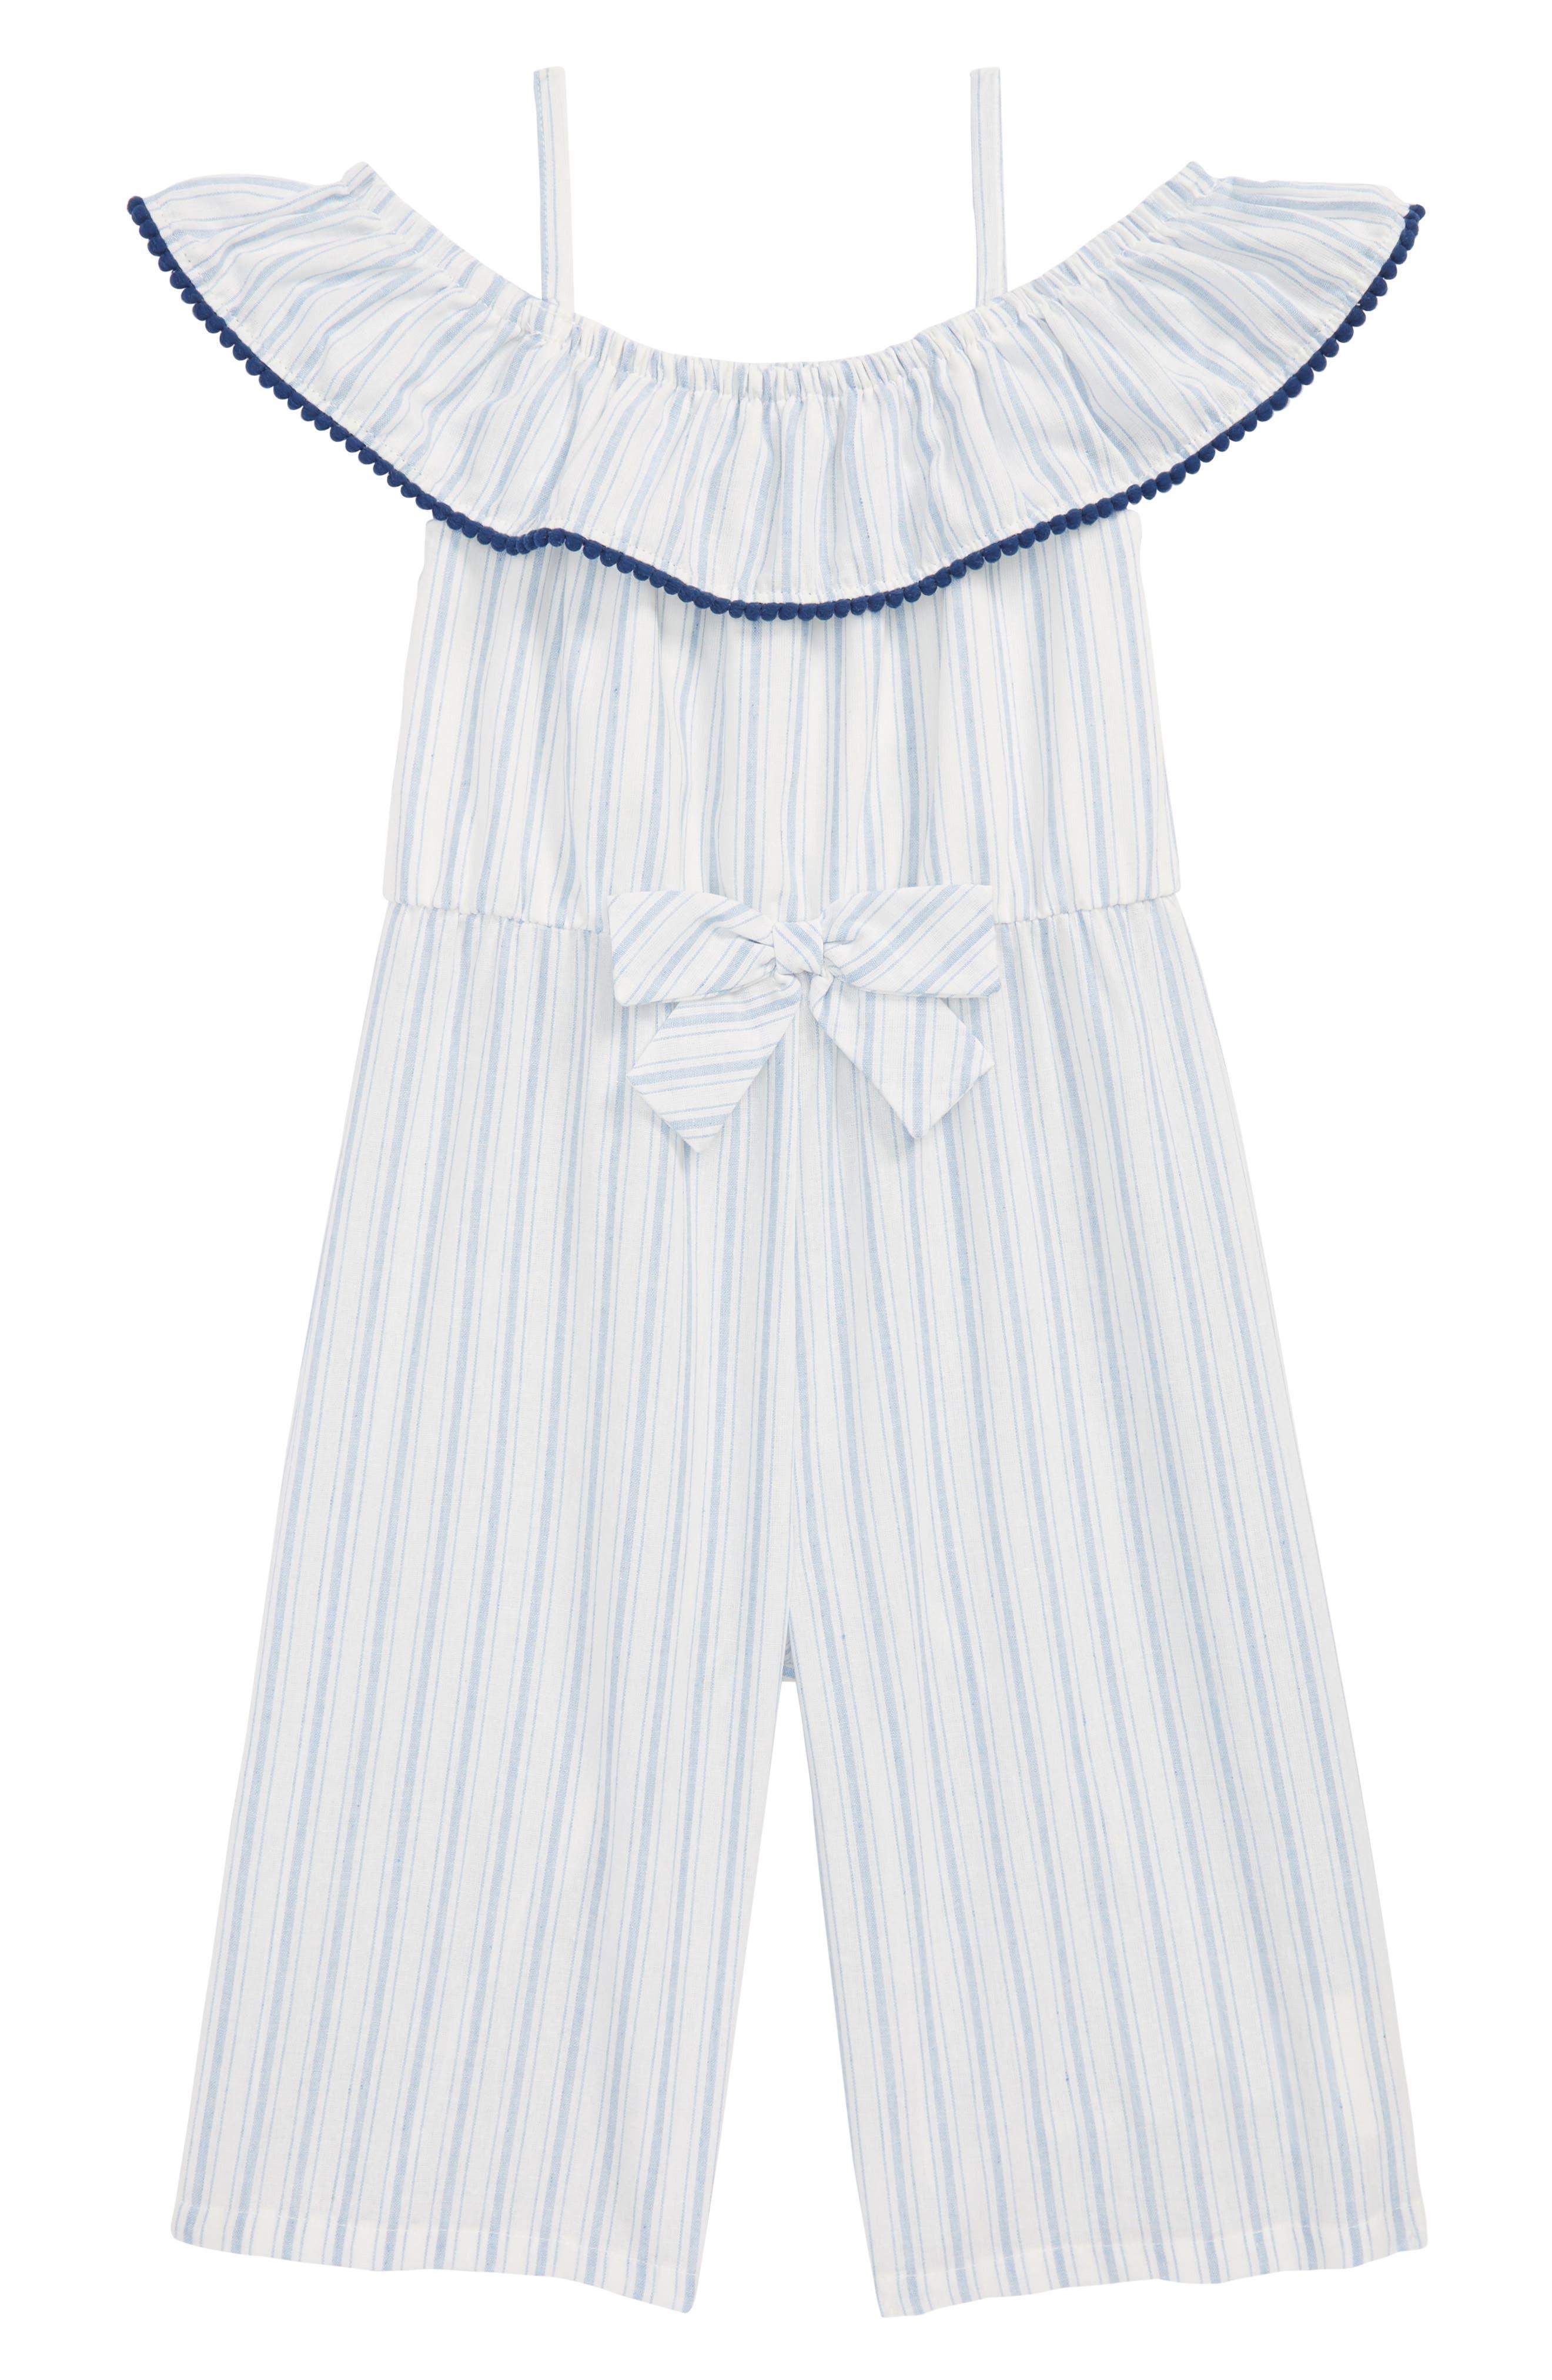 Pom Pom Striped Jumper,                             Main thumbnail 1, color,                             Blue/ White